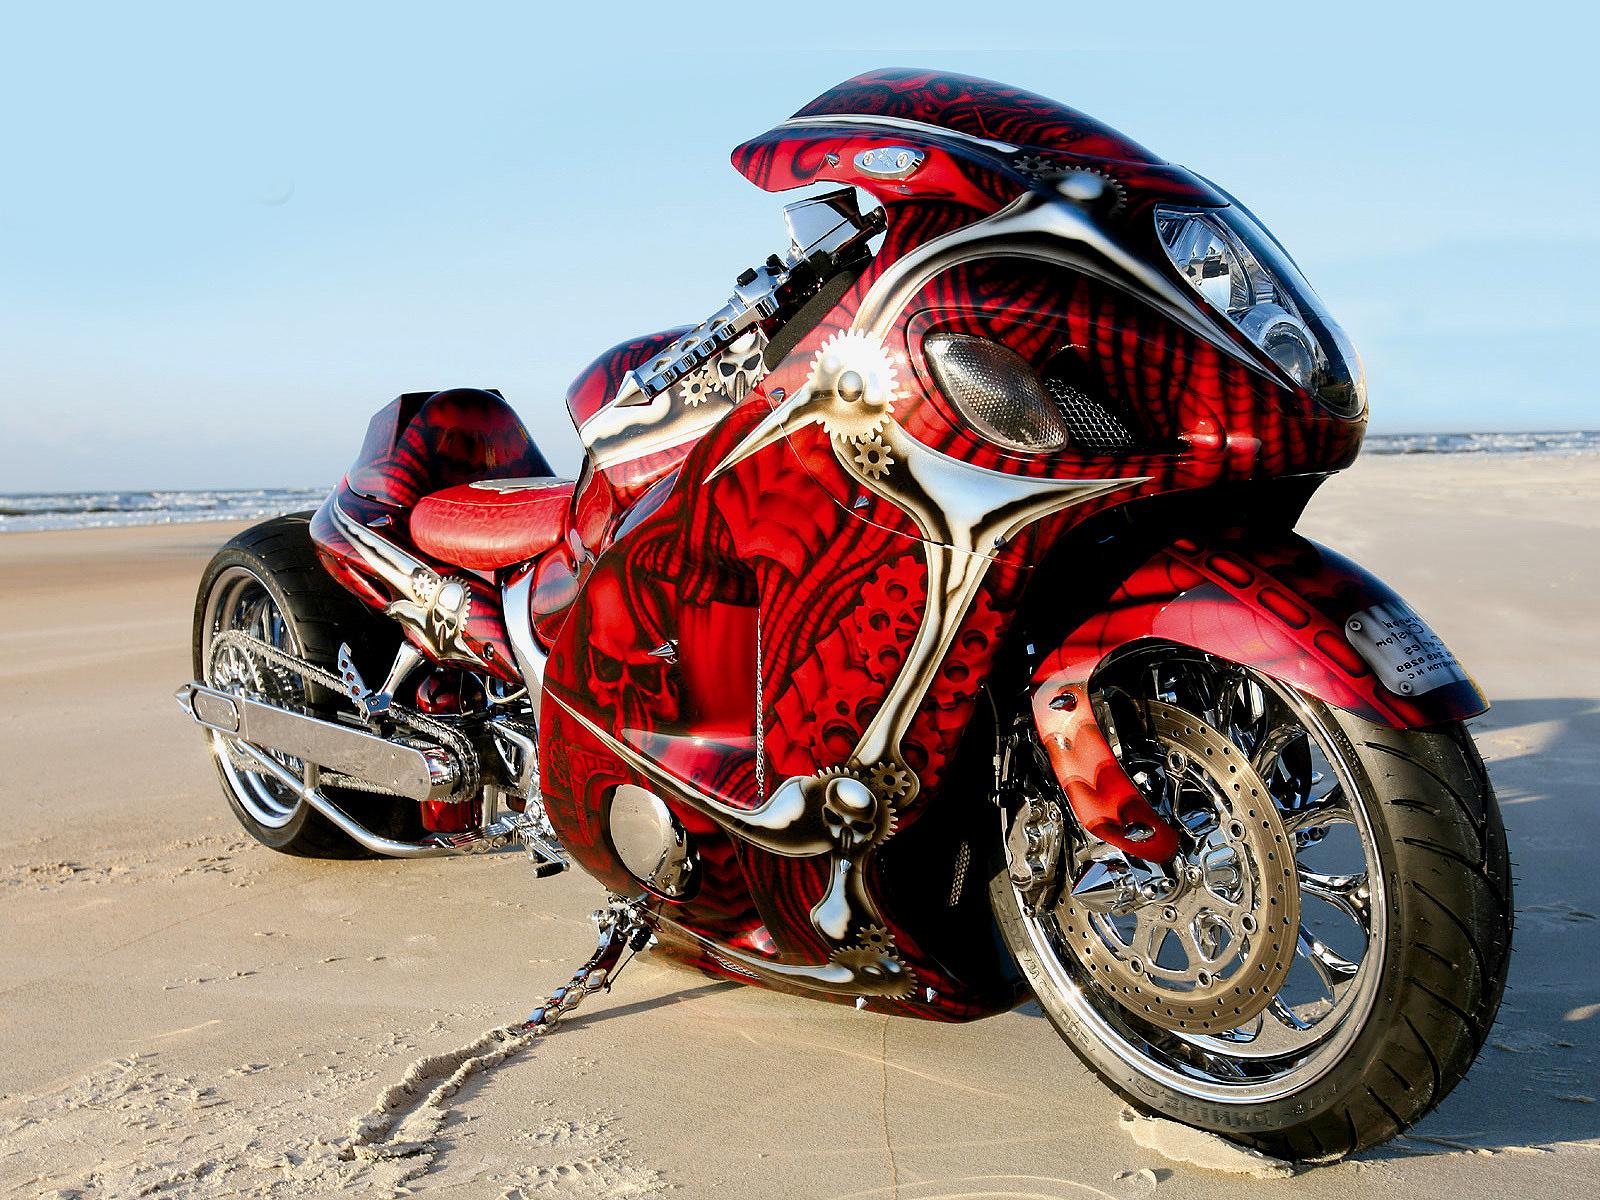 Beautiful MotorCycles Wallpaper HD Freetopwallpapercom 1600x1200